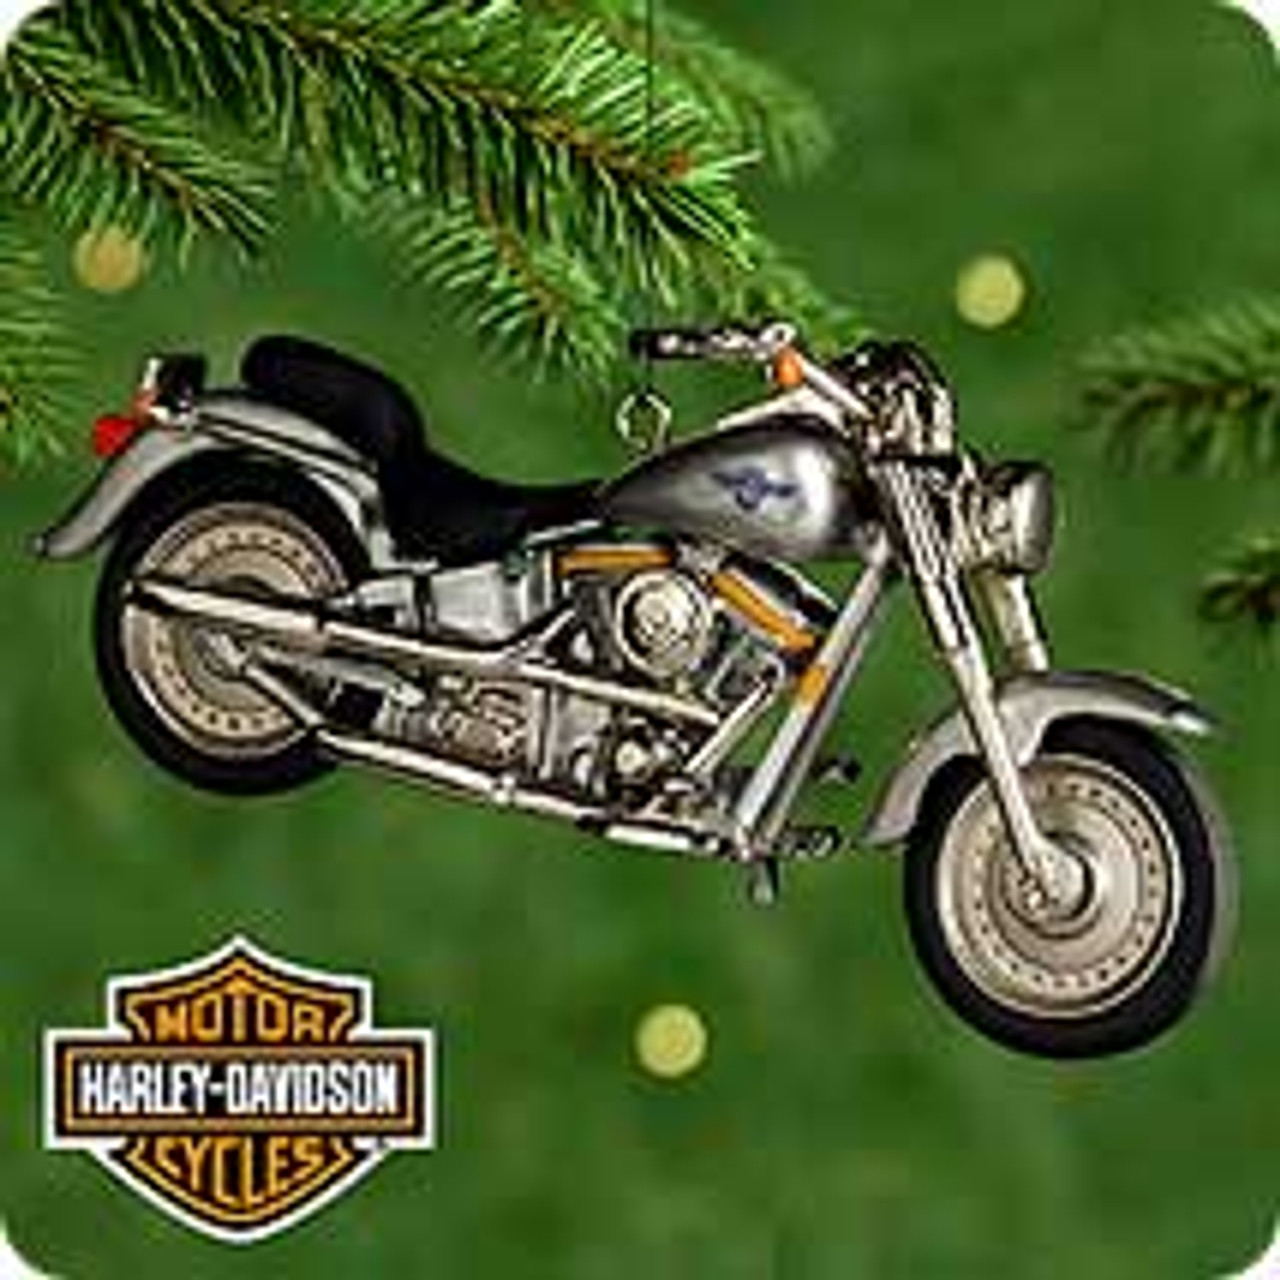 2000 Harley Davidson 2 Fat Boy Hallmark Ornament The Ornament Shop